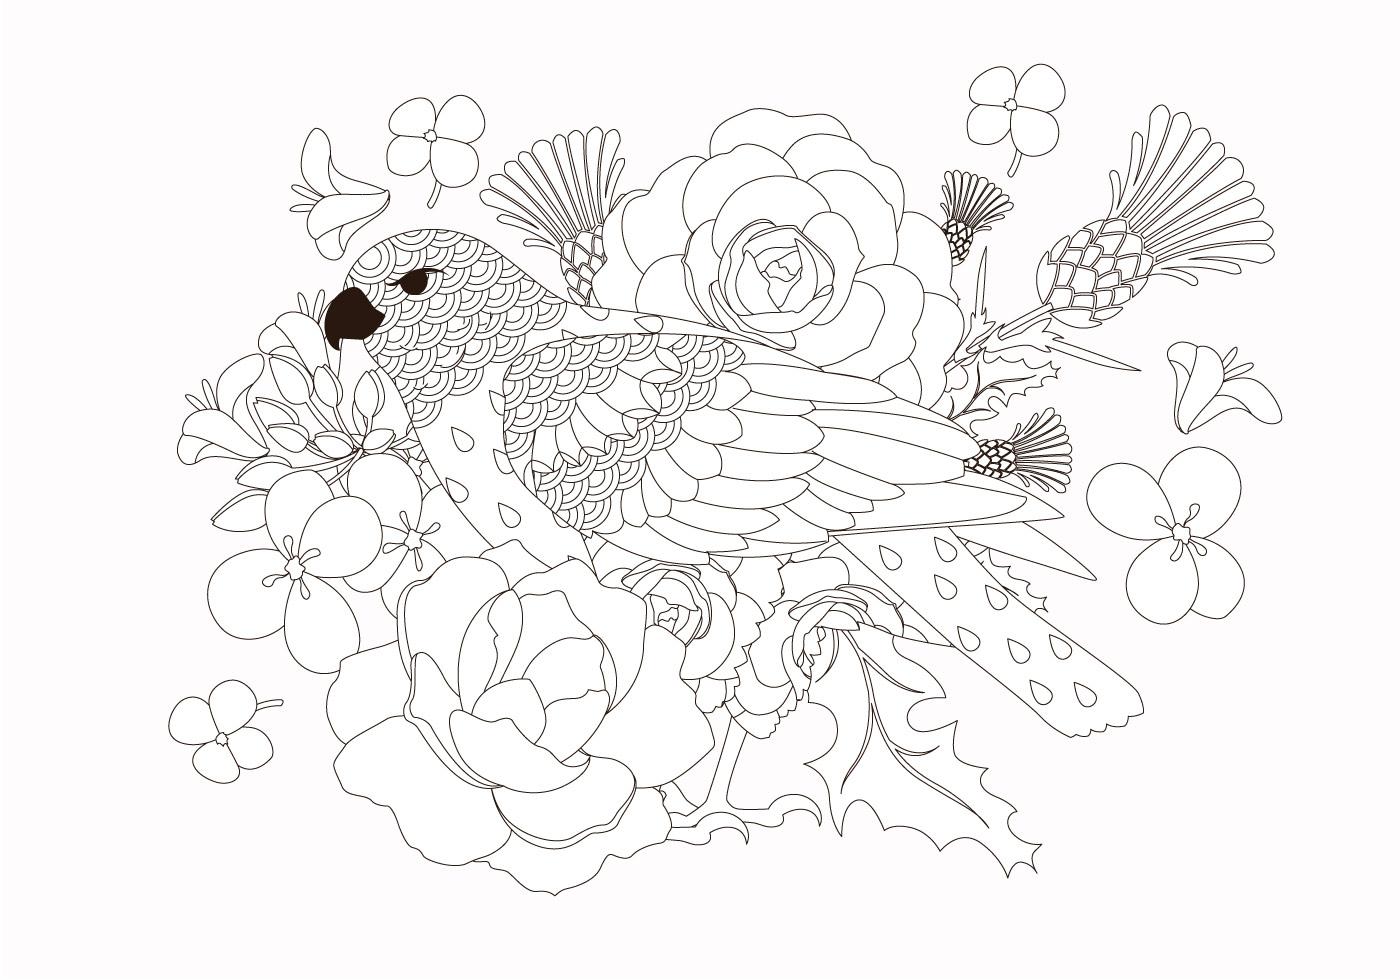 Coloring Book Bird Animal Vector Download Free Vectors Clipart Graphics Vector Art